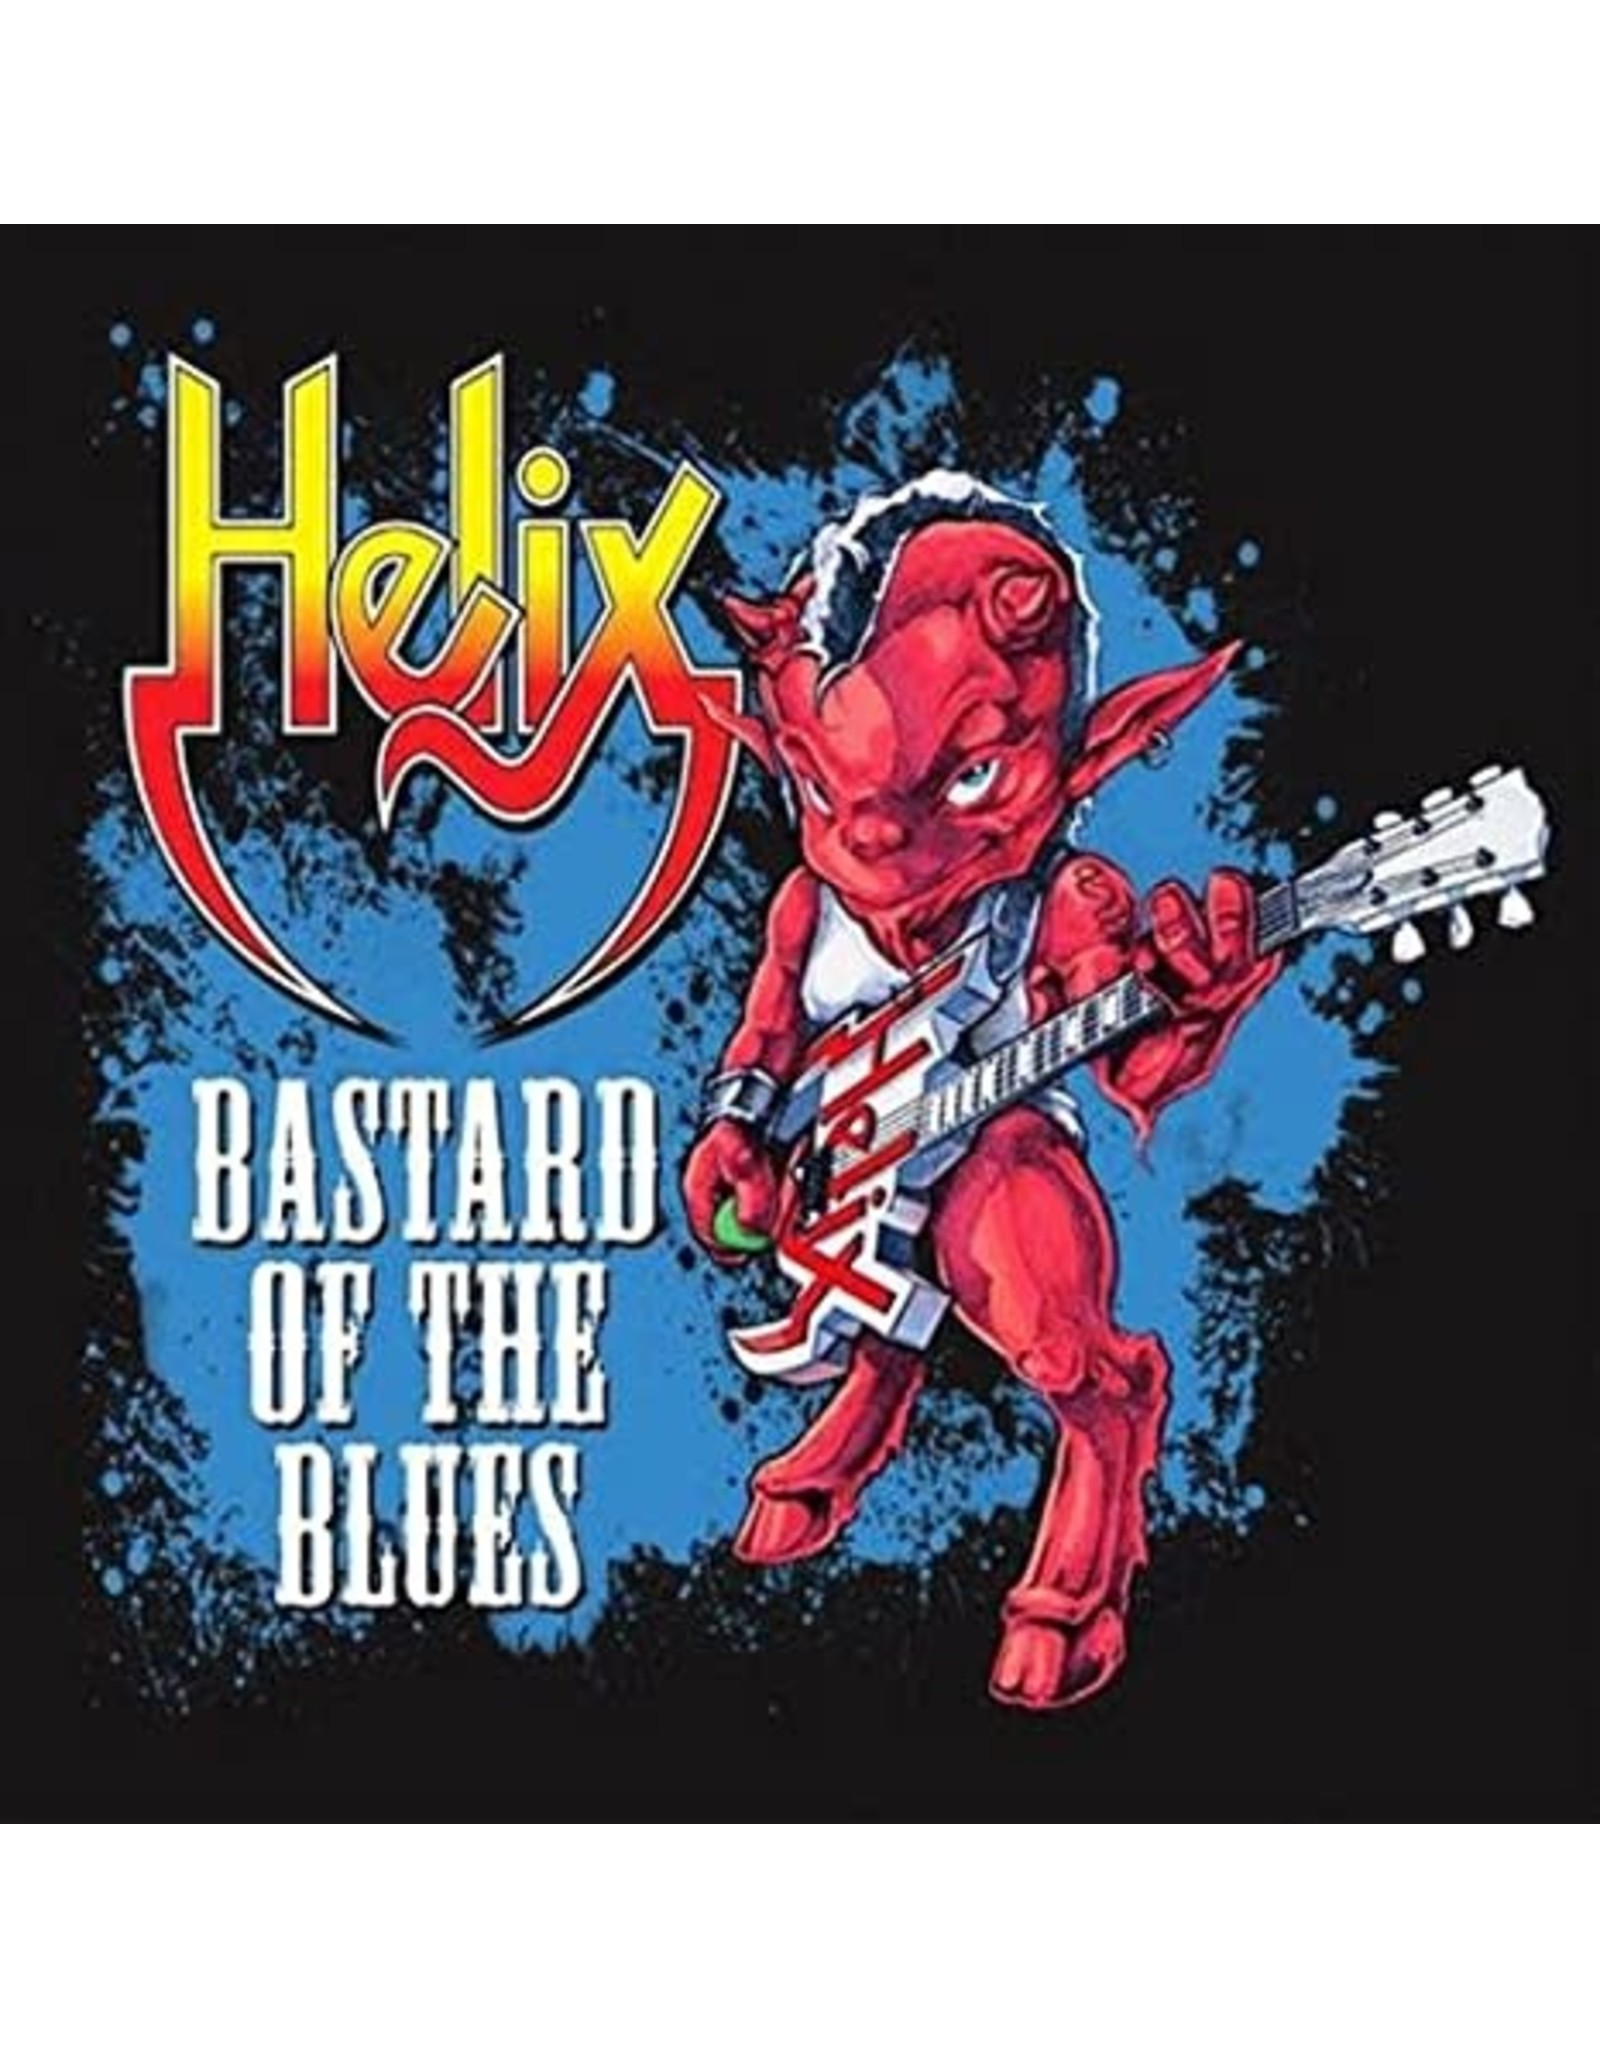 Helix - Bastard of the Blues CD